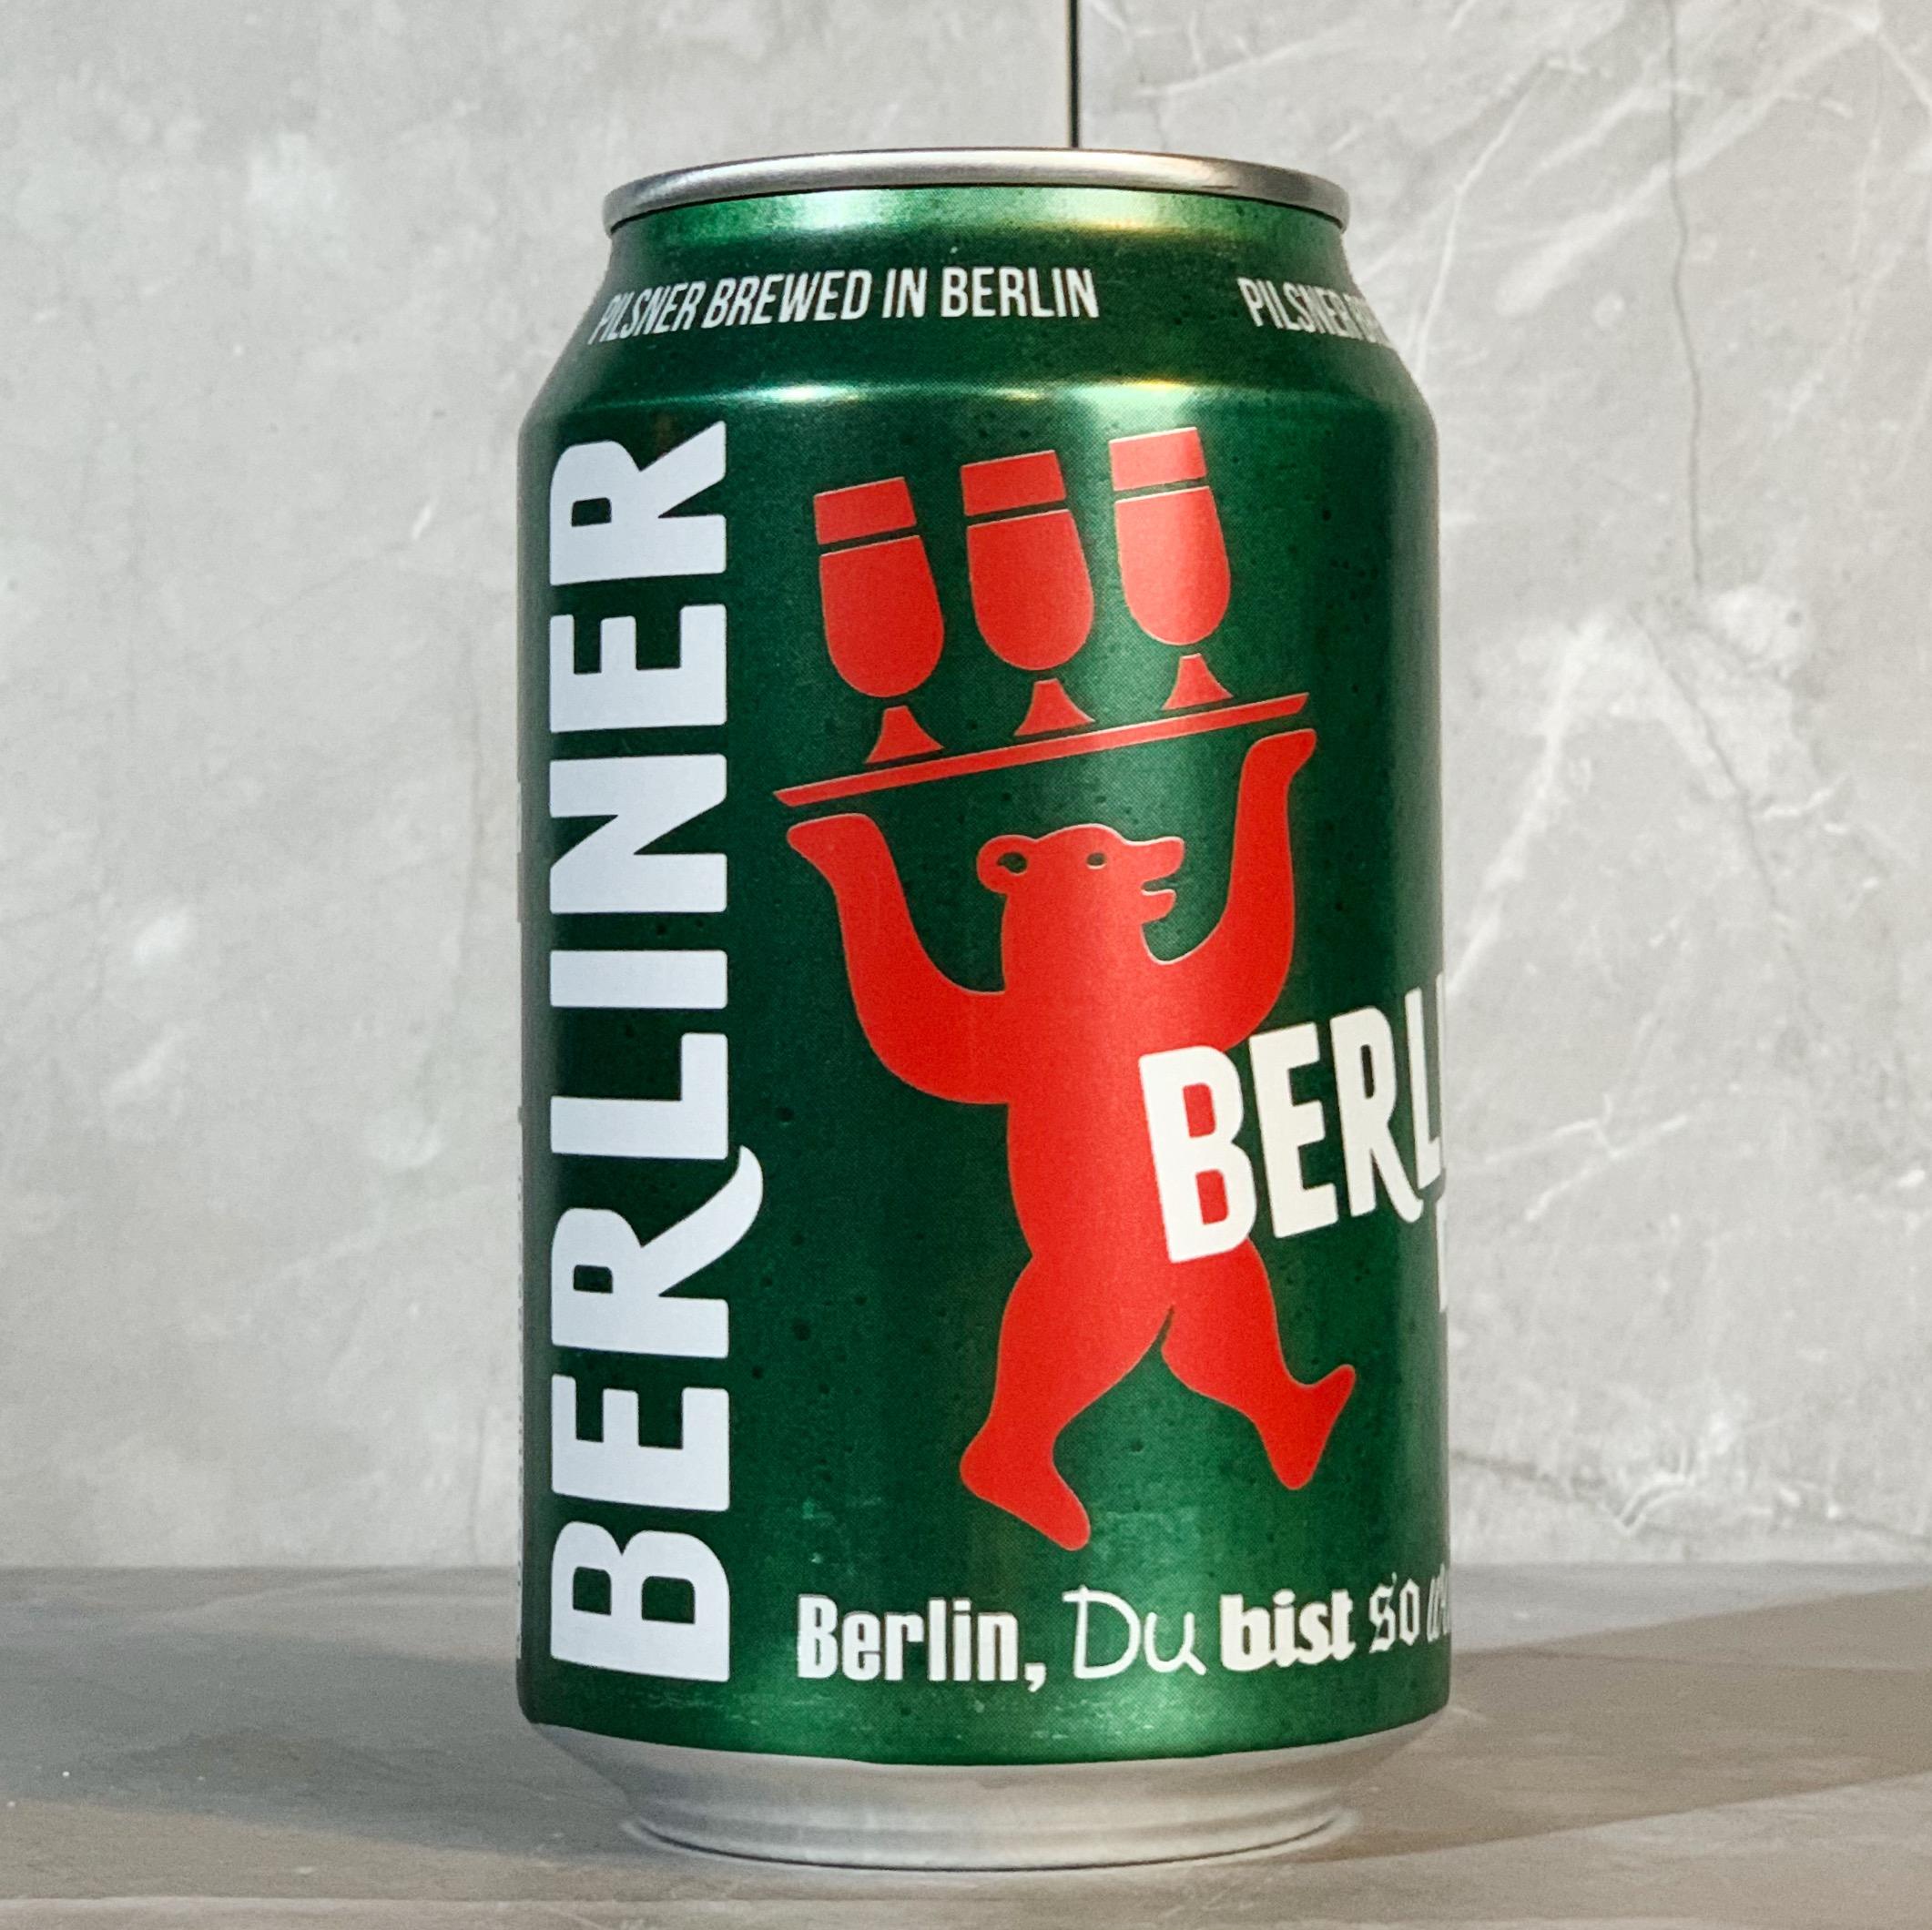 BERLINER | PILSNER | 5.0% ABV | 330ML | BULK BUY DISCOUNTS AVAILABLE